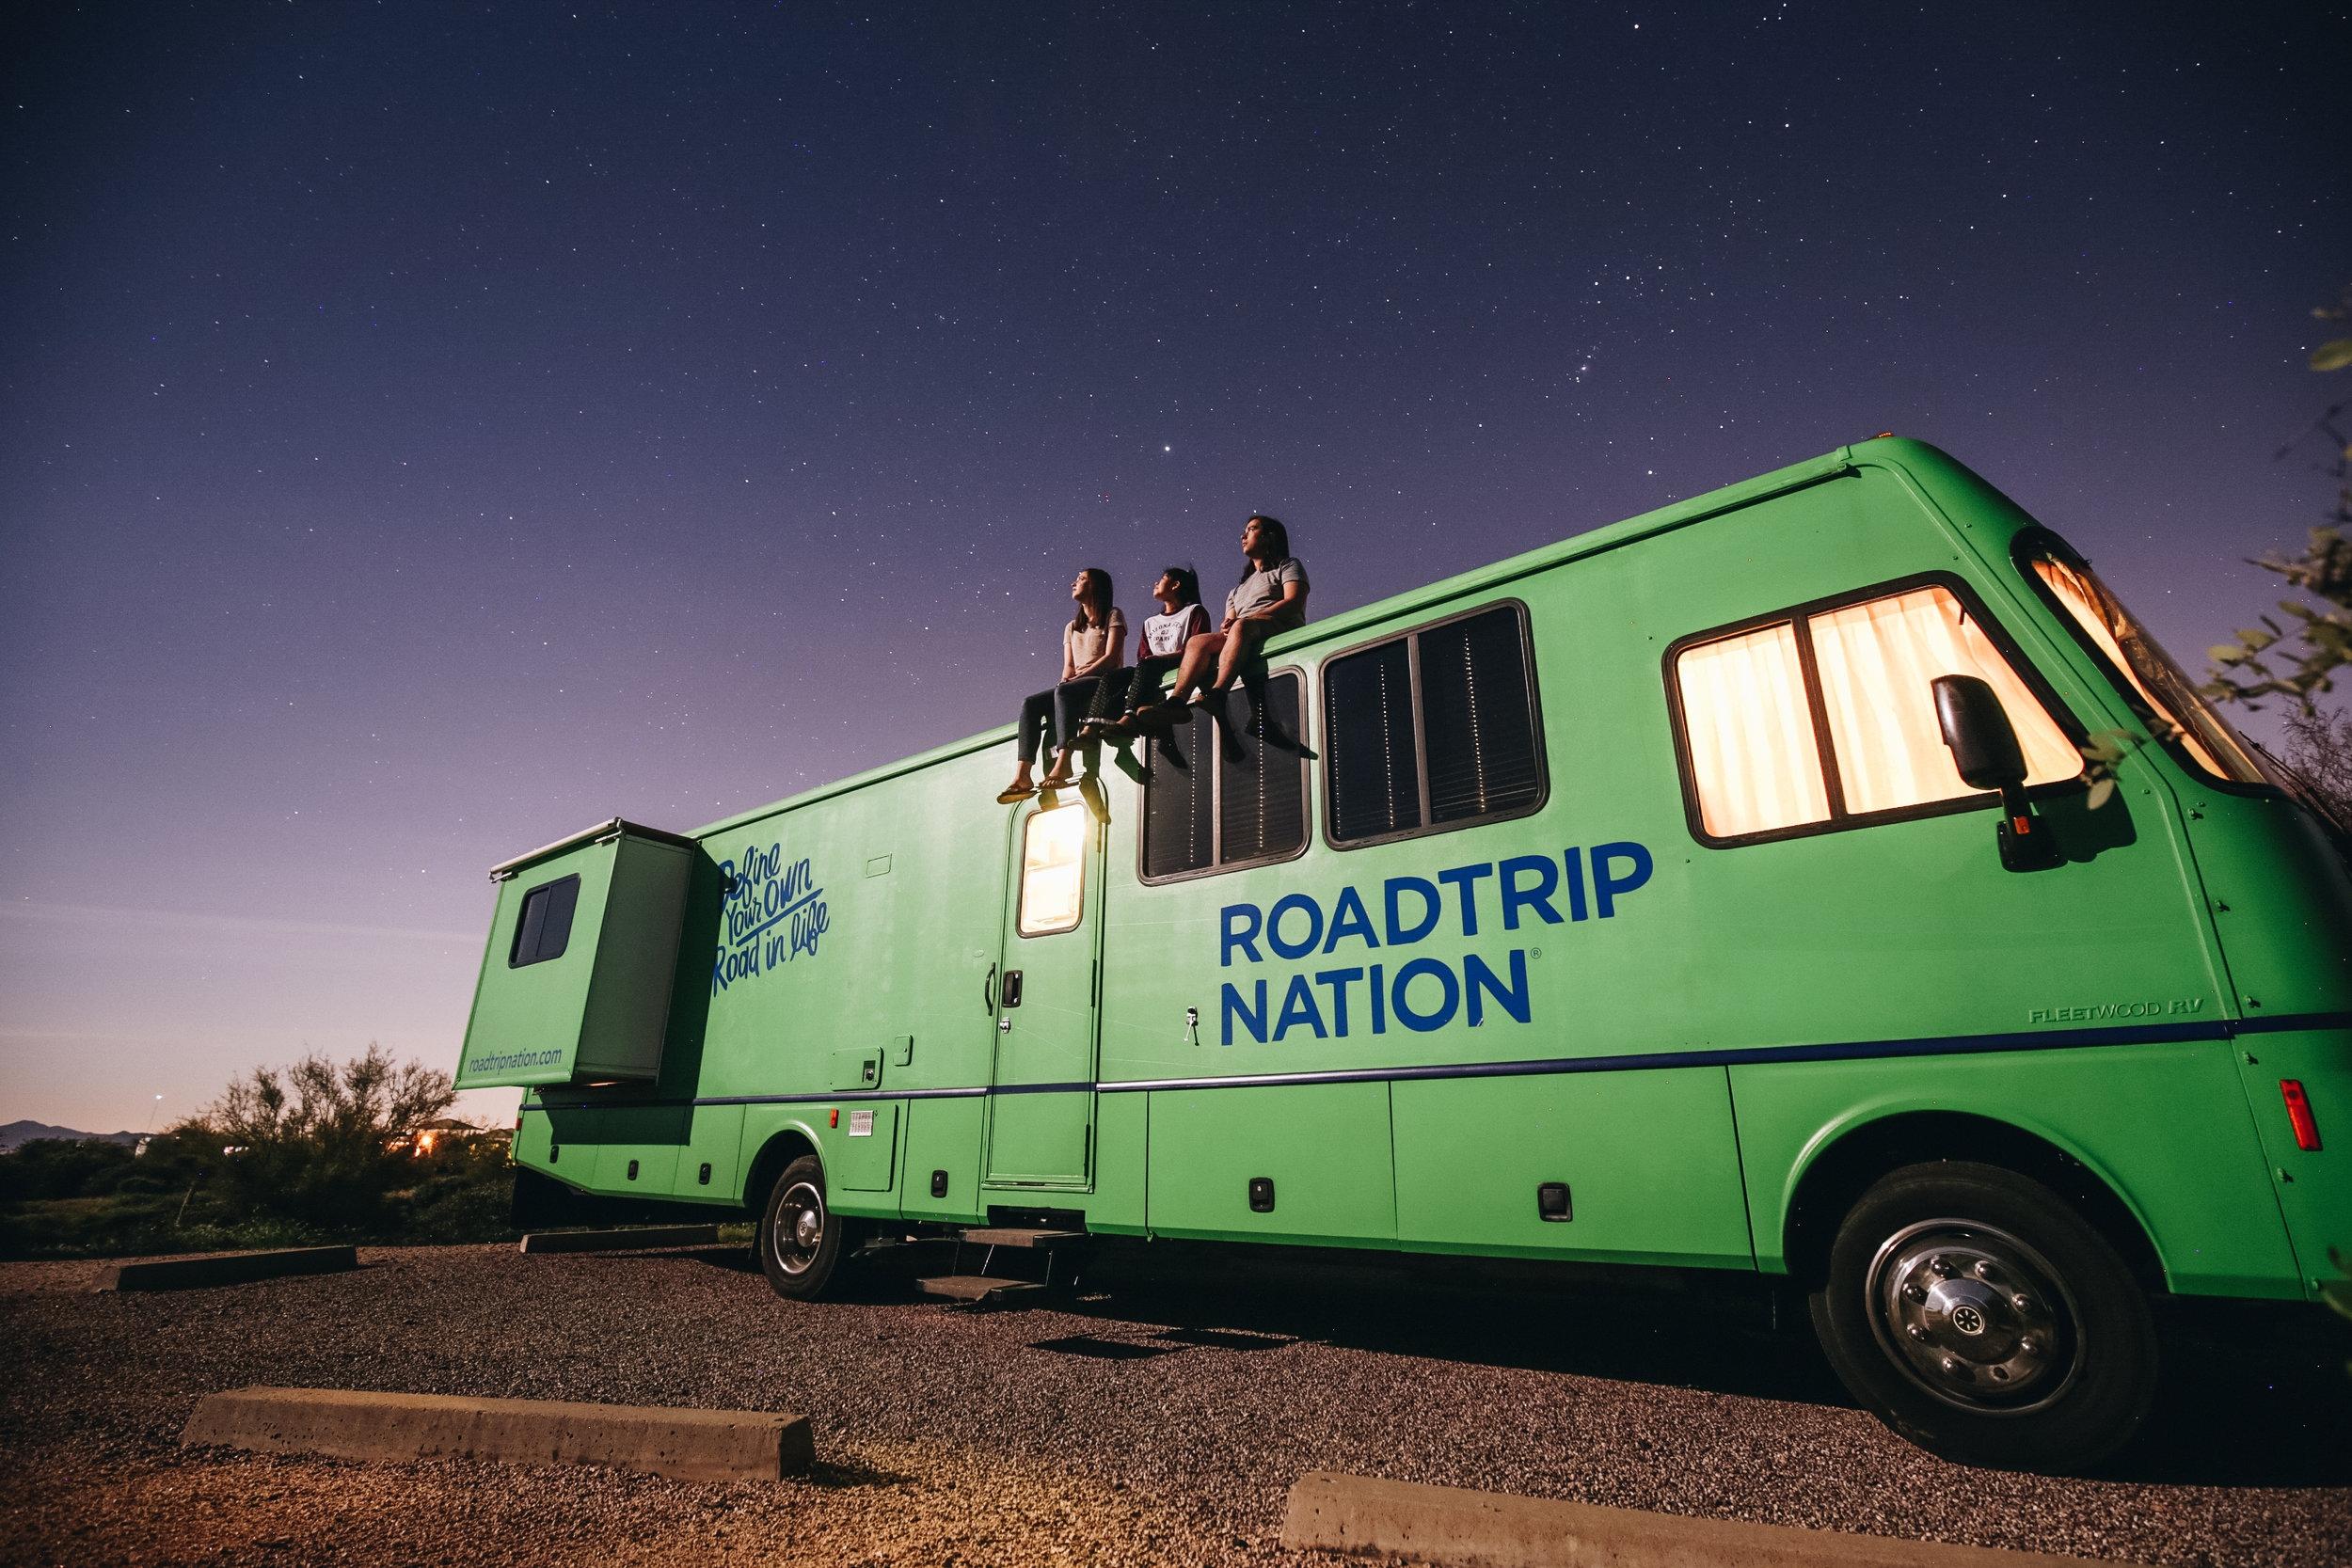 roadtrip nation: future west